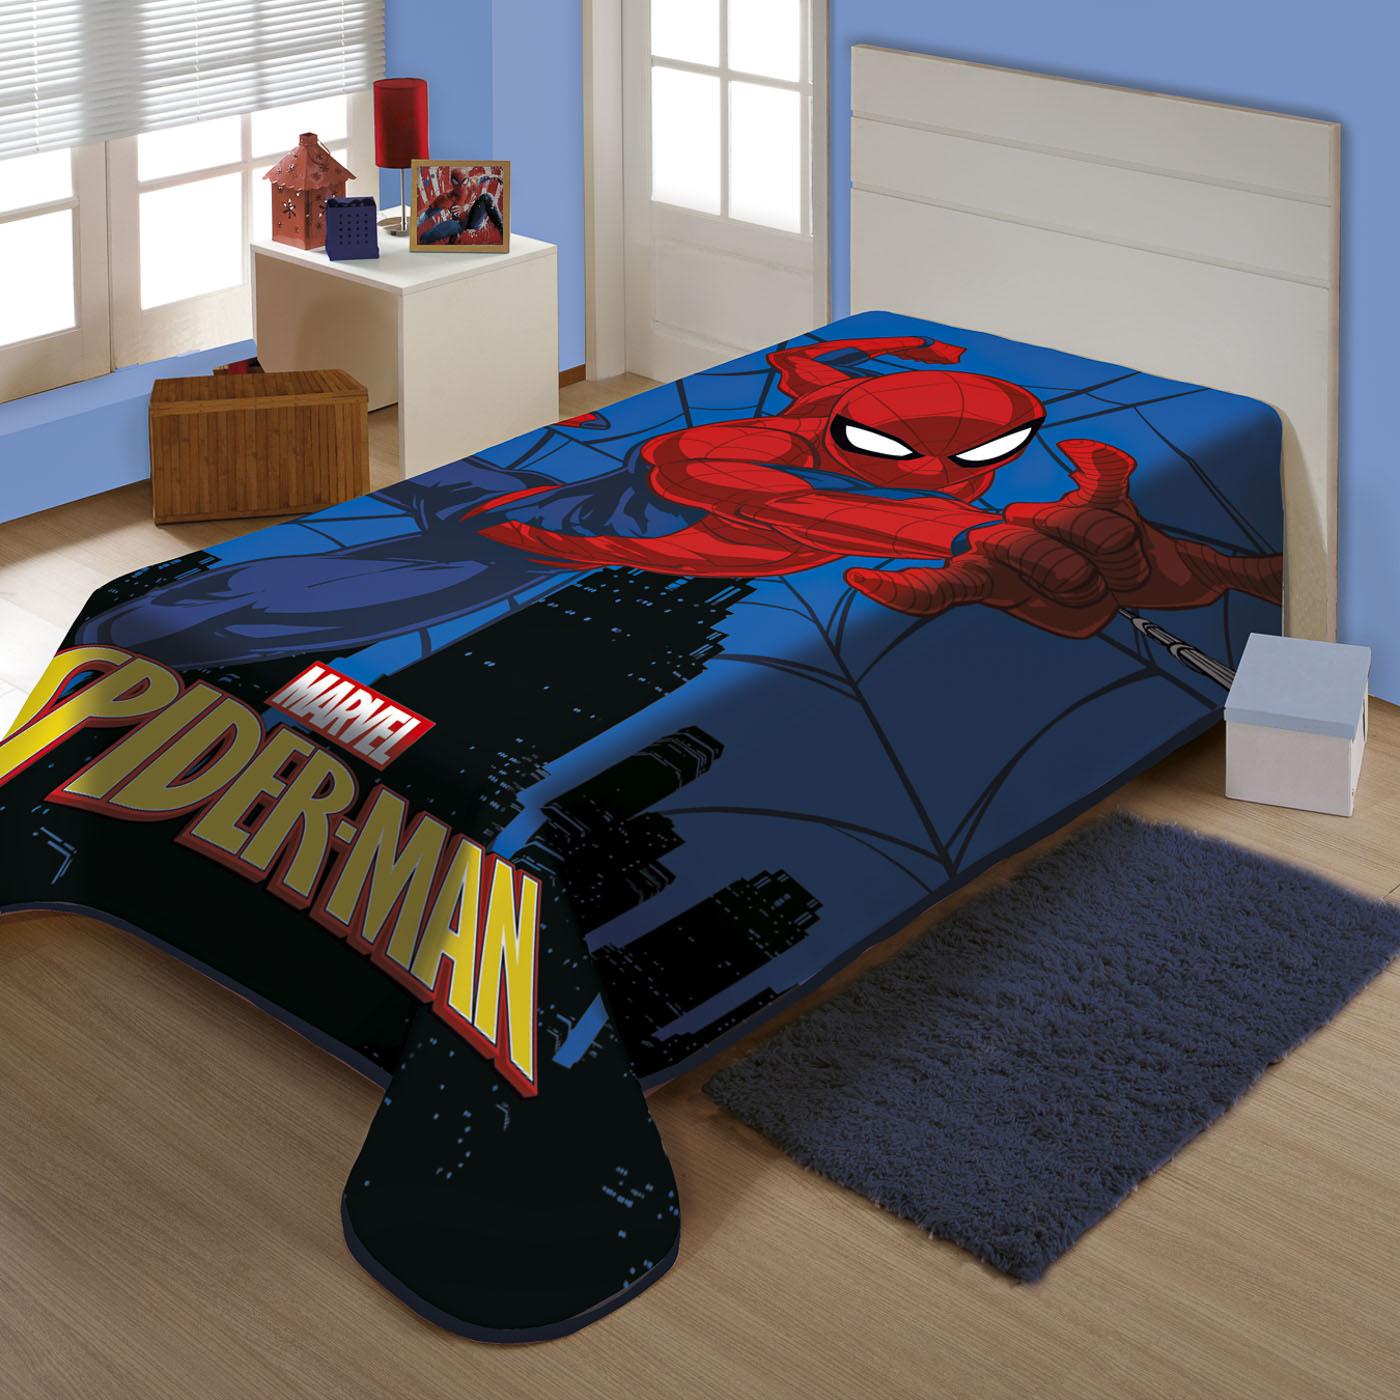 Cobertor Solteiro Juvenil Raschel Plus Jolitex  Homem Aranha